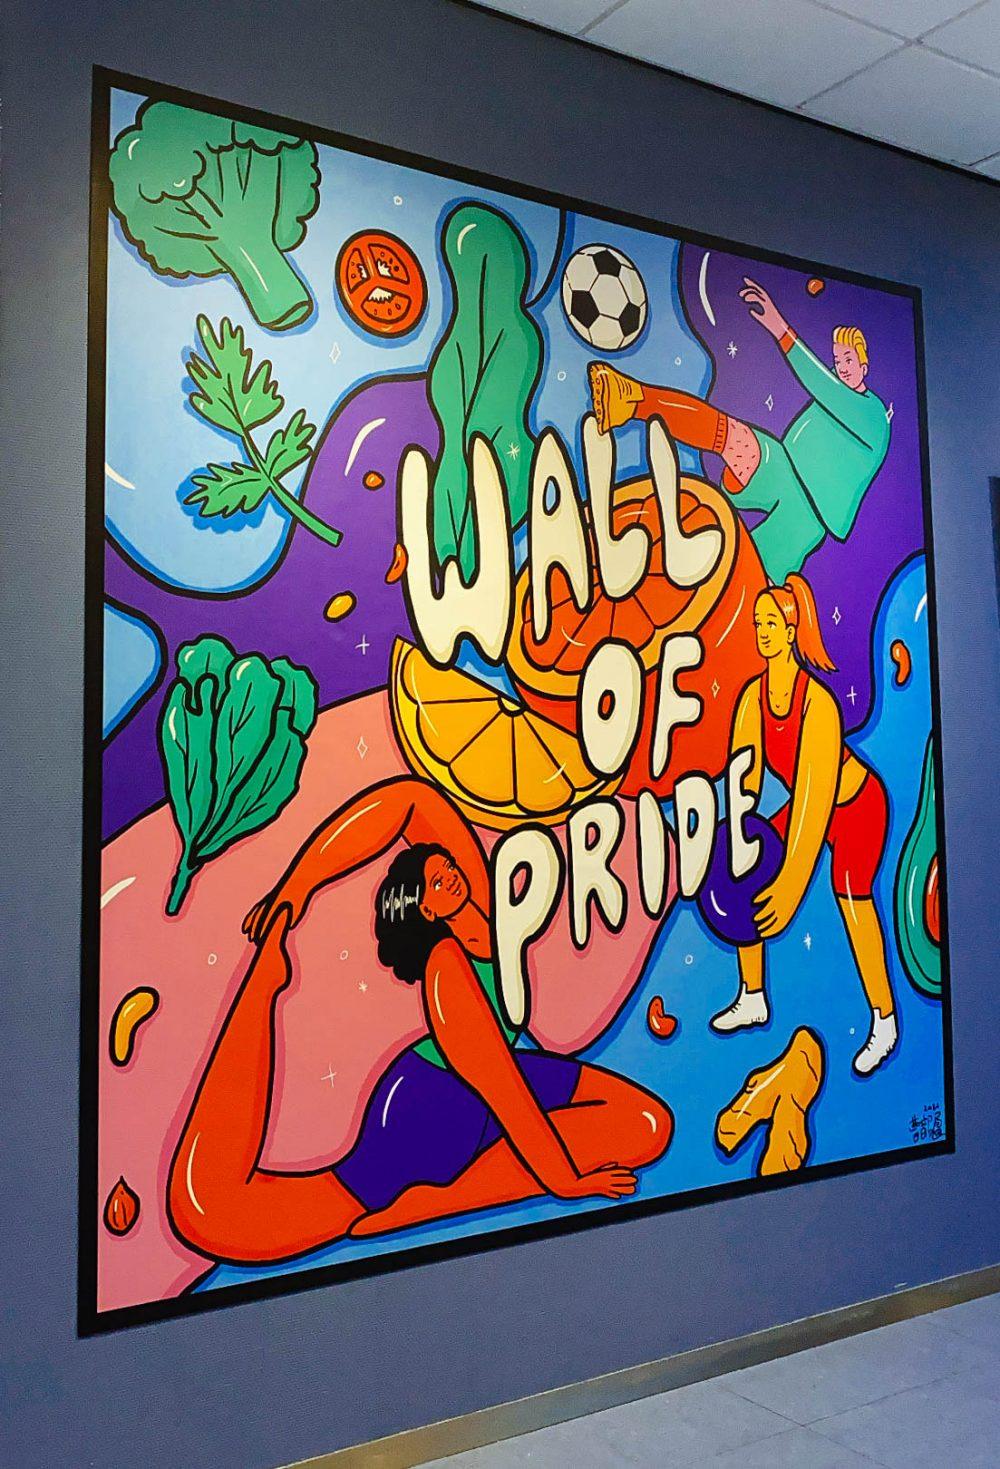 Wall of Pride, Hva June 2021